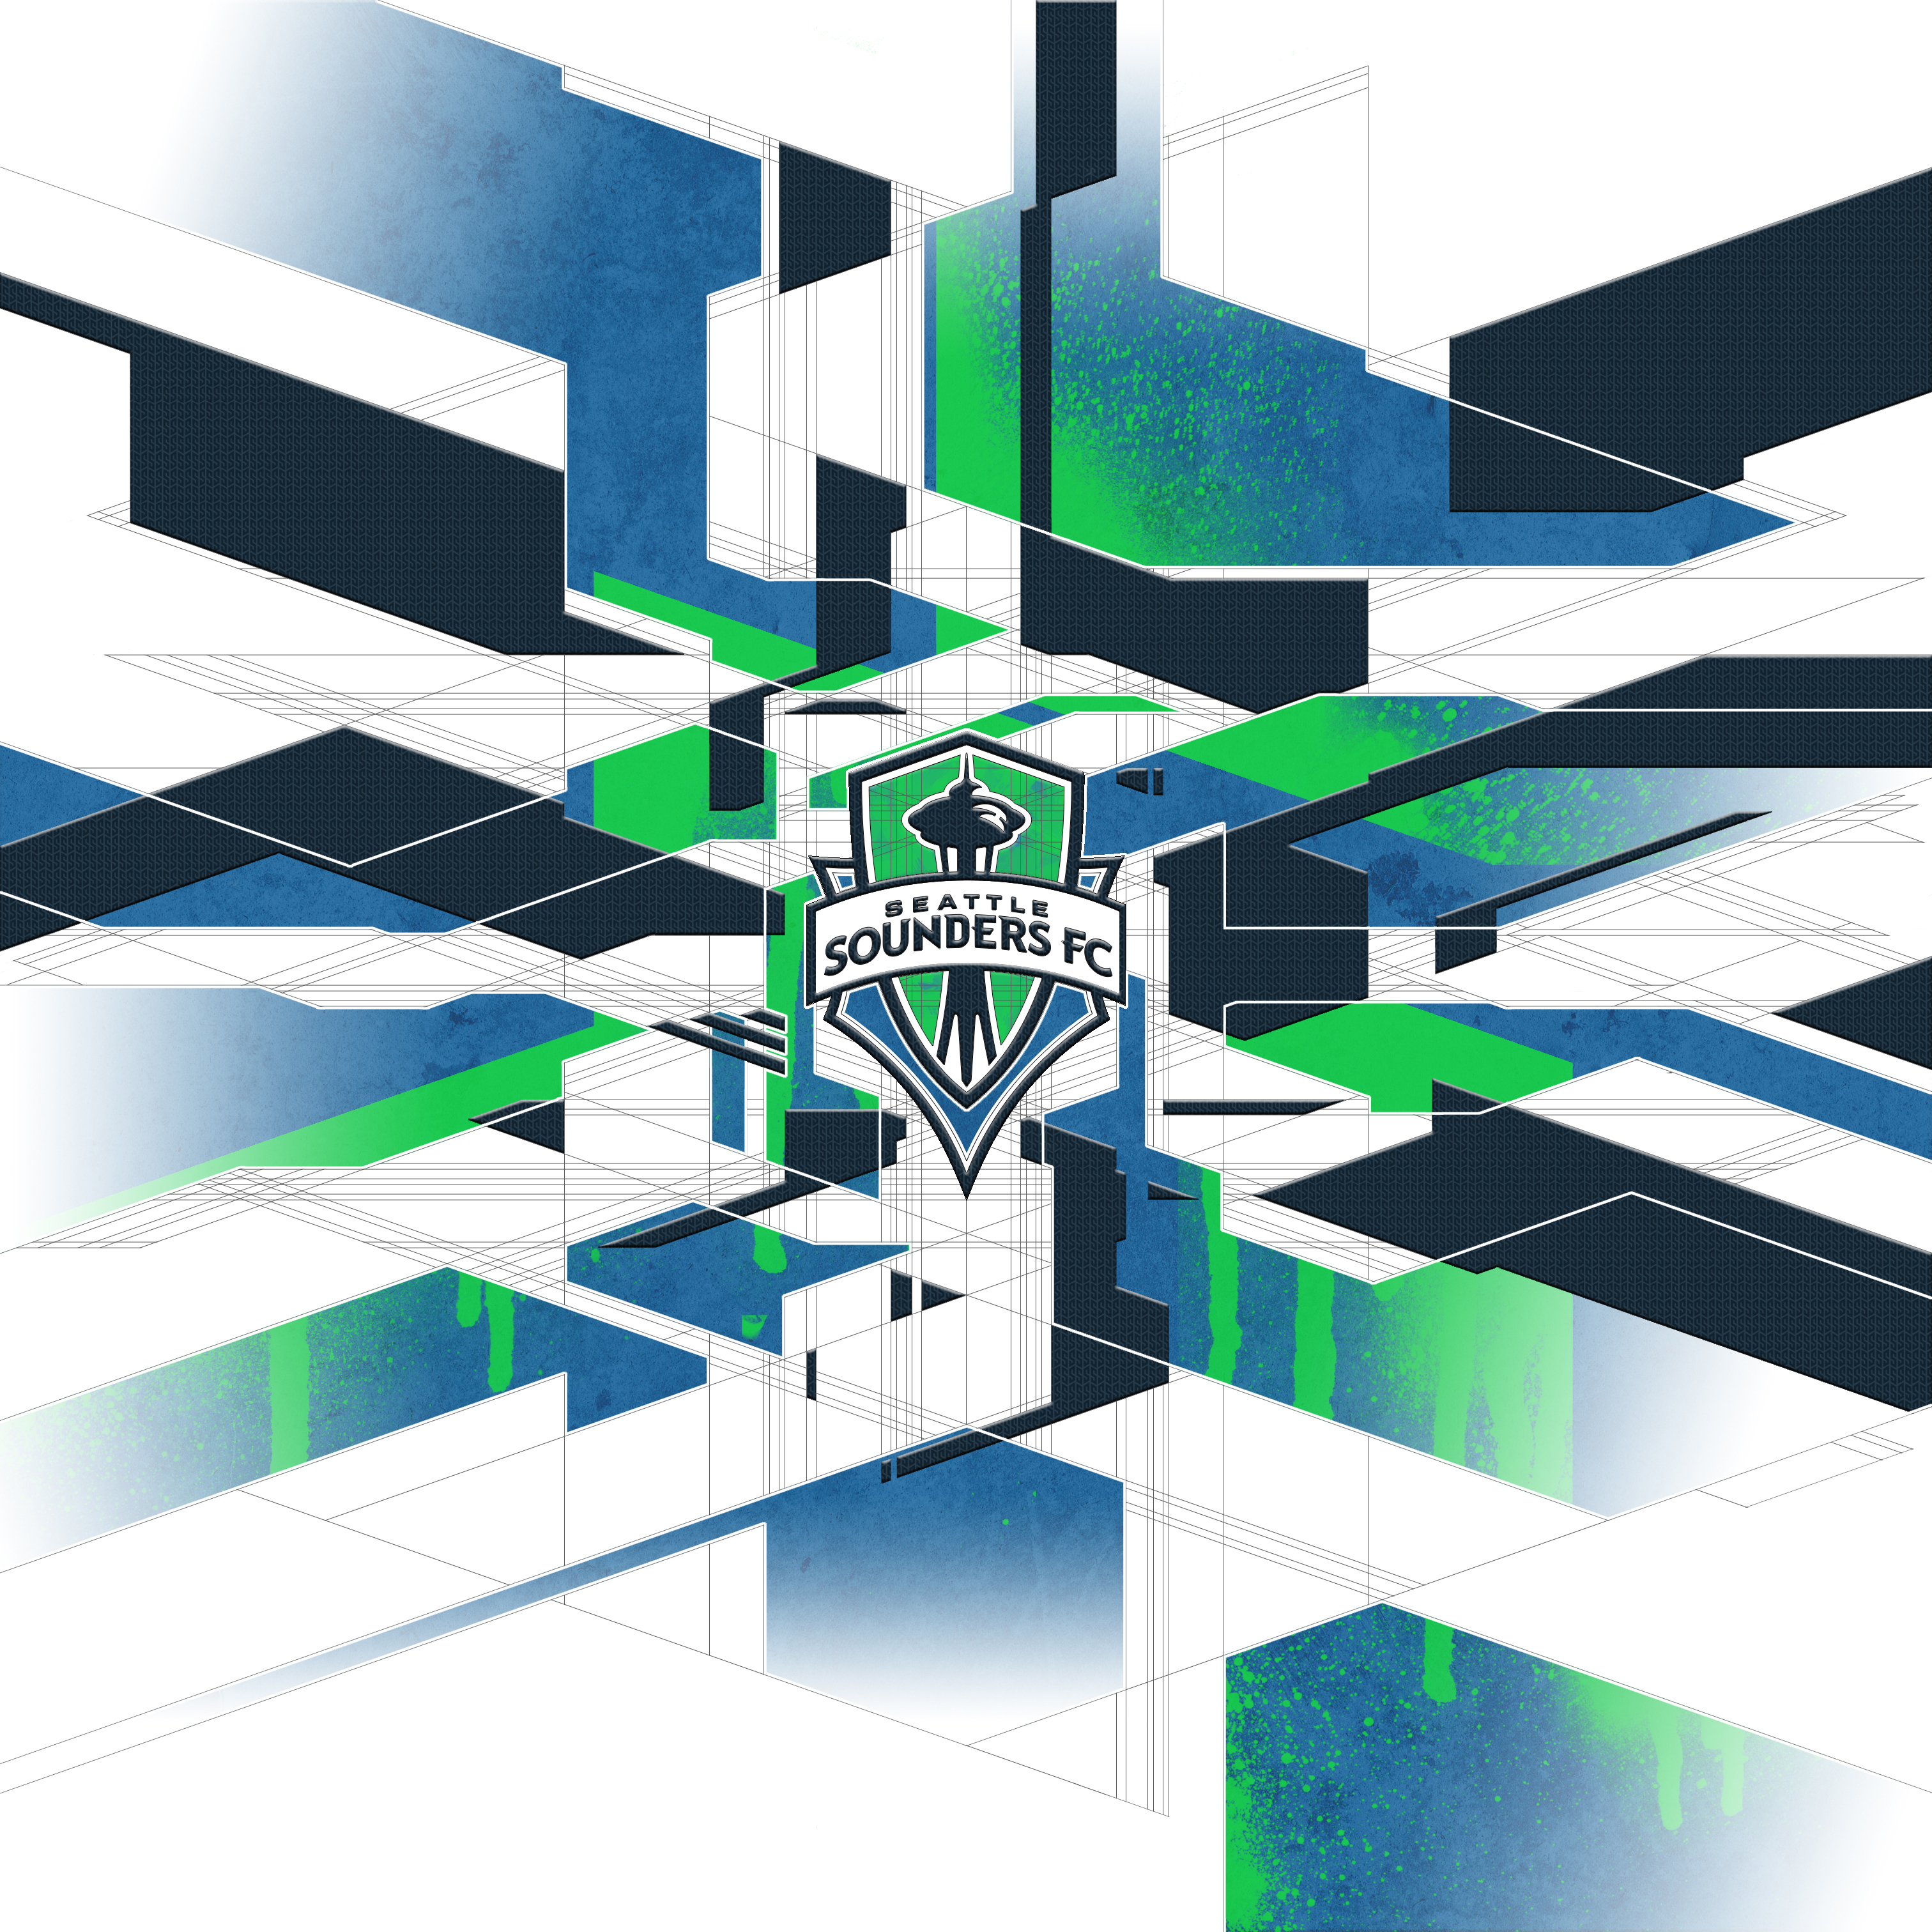 Seattle Sounders goalkeeper Stefan Freis original design now 3024x3024